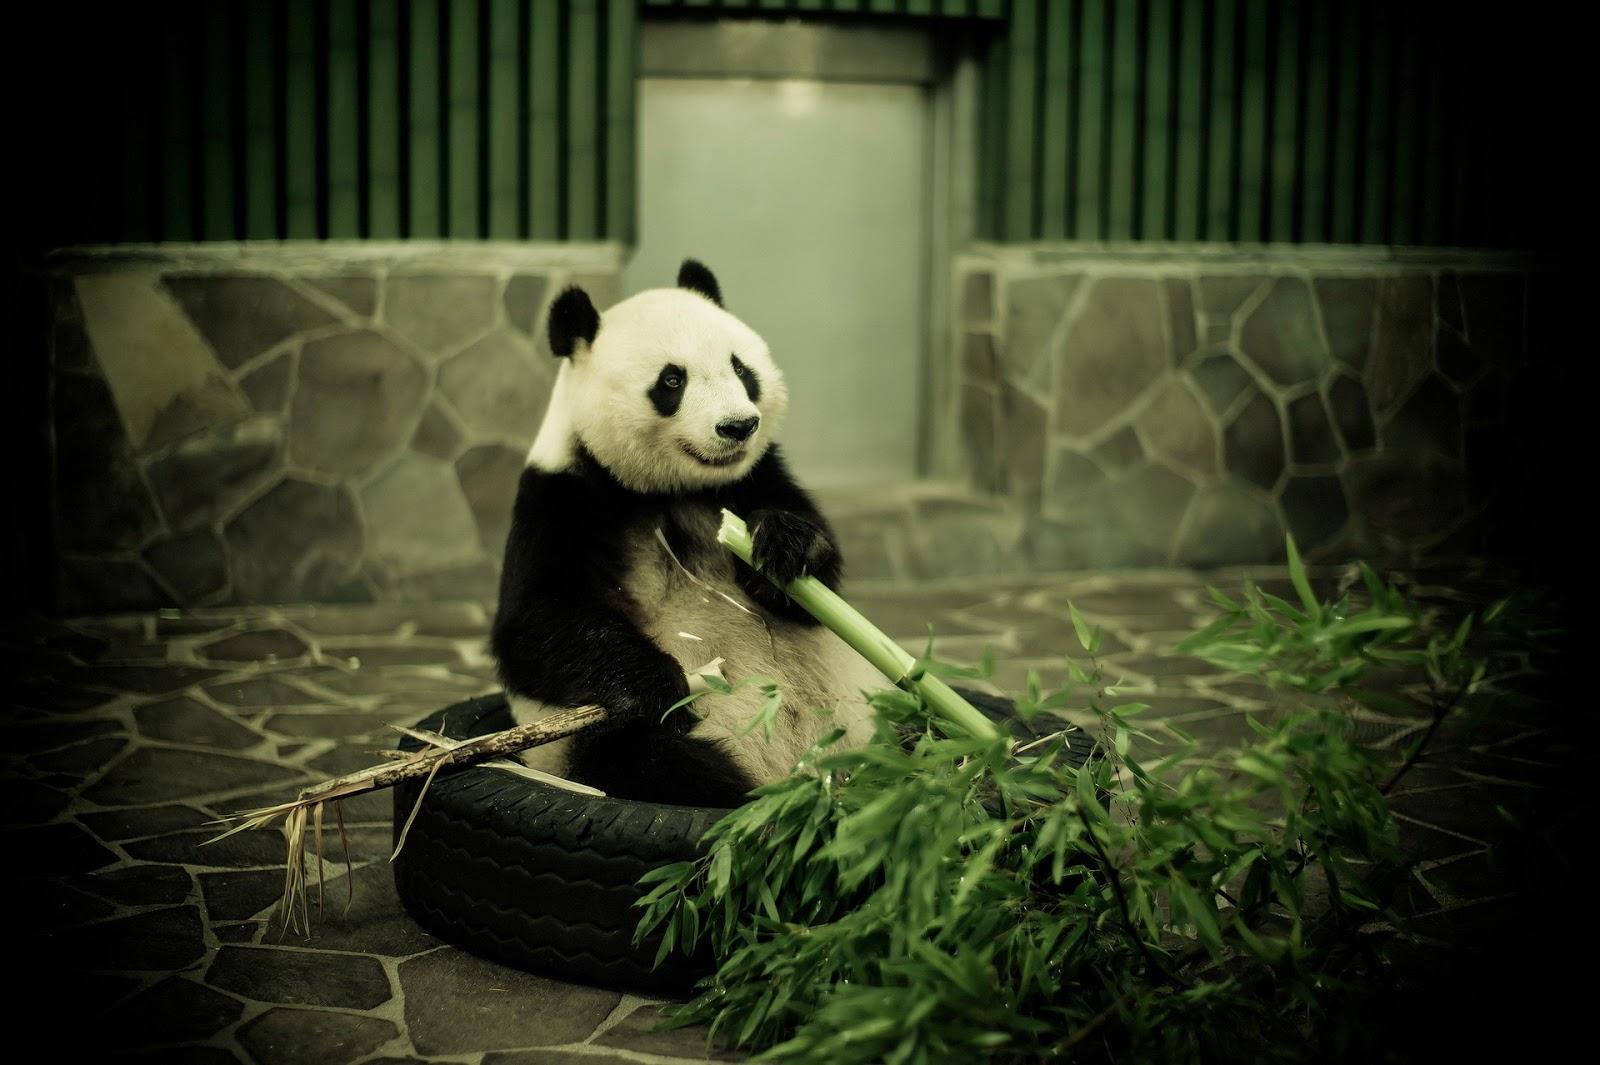 Imagenes Hilandy: Fondo De Pantalla Animales Oso Panda